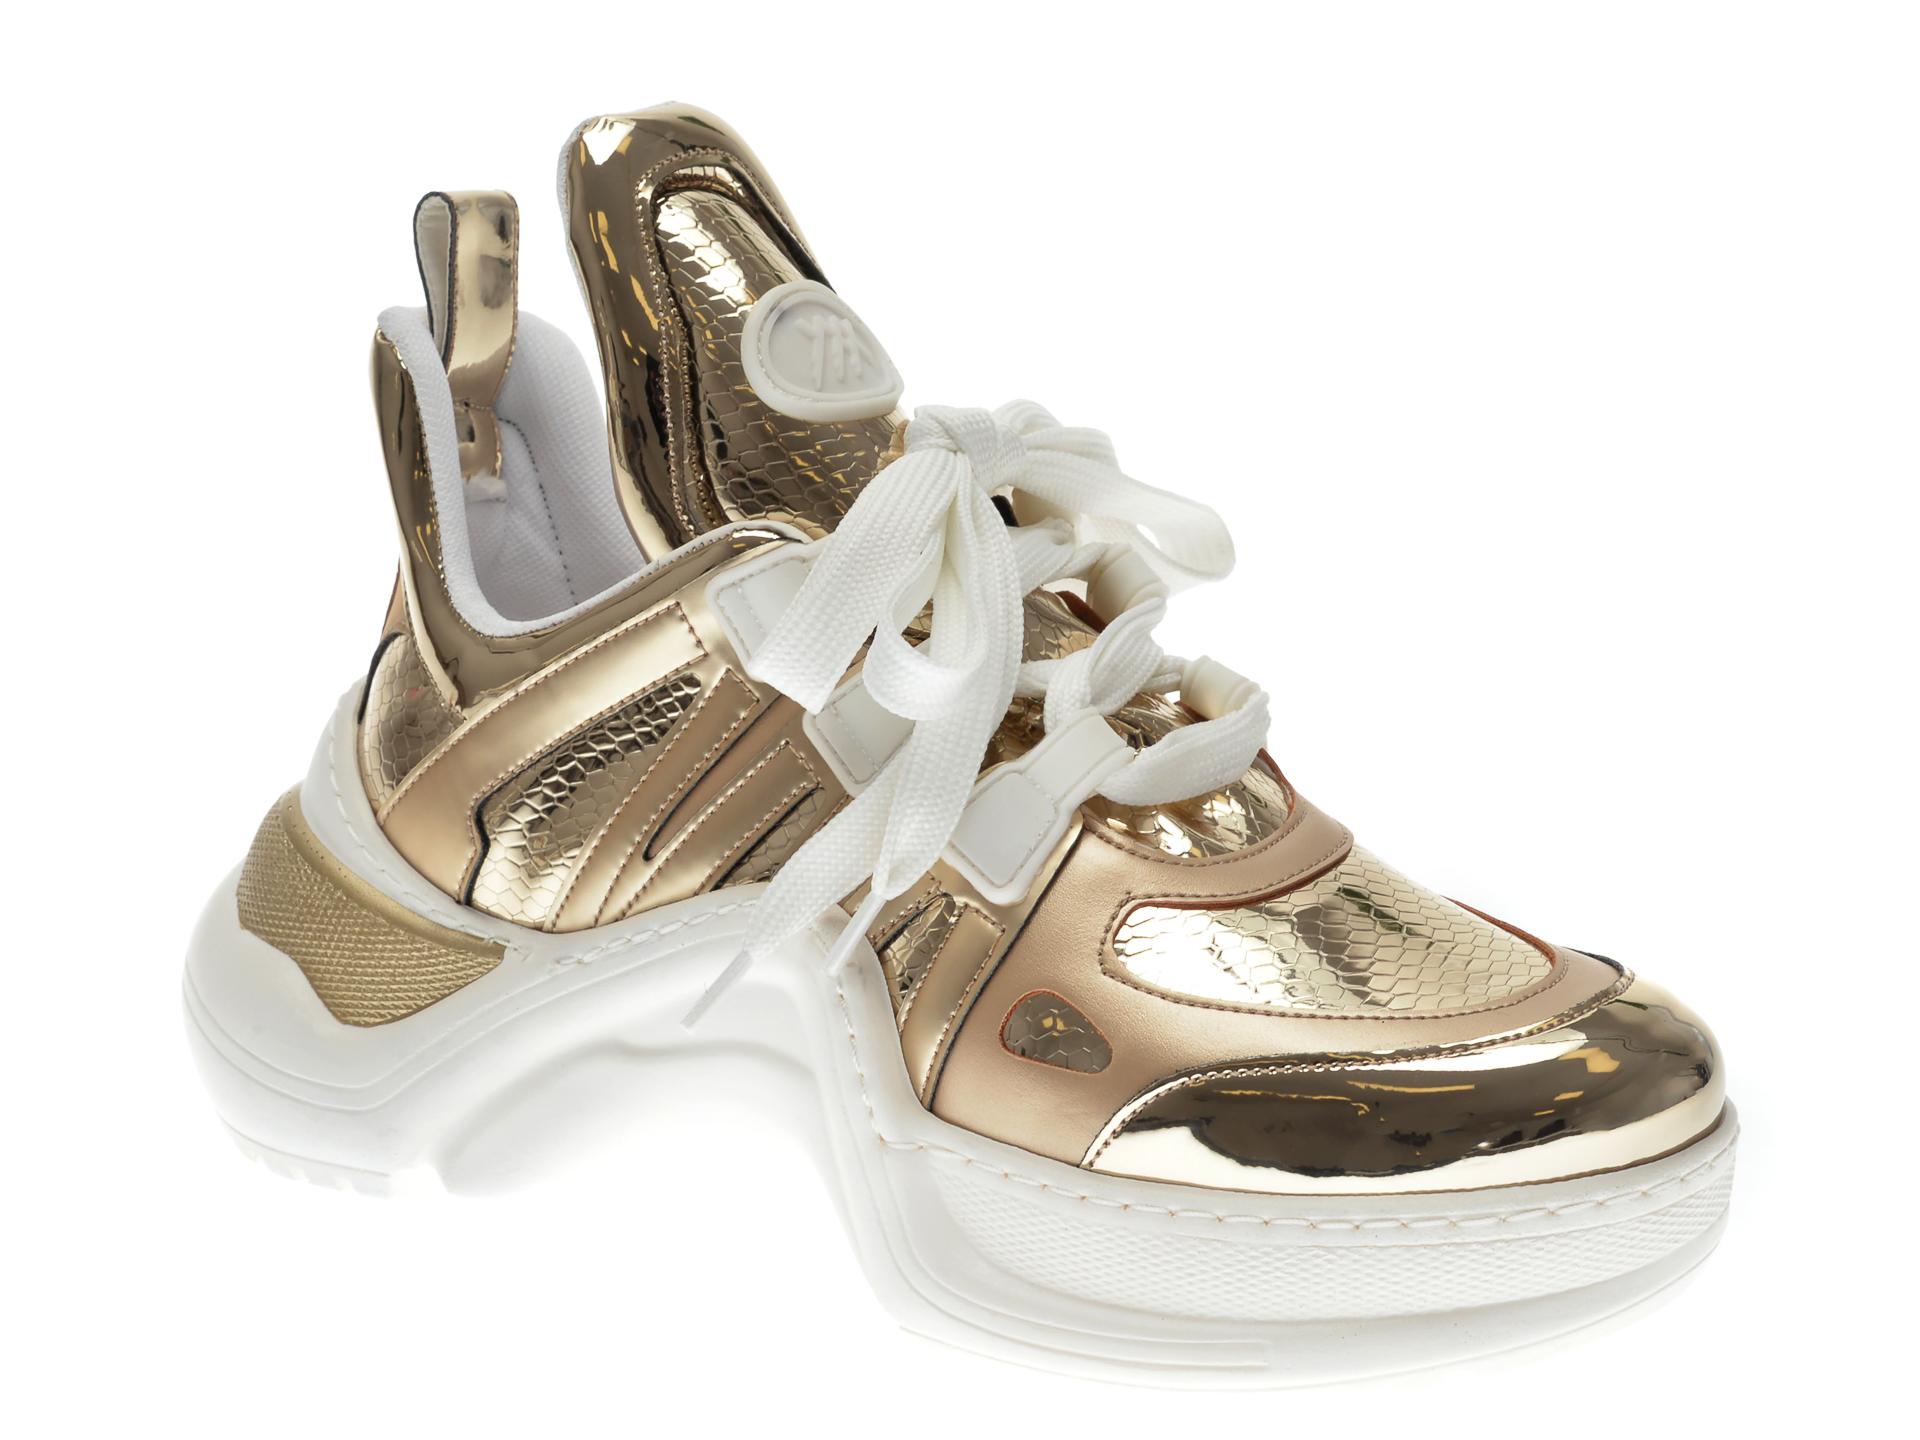 Pantofi sport GRYXX aurii, MK1043, din piele ecologica imagine